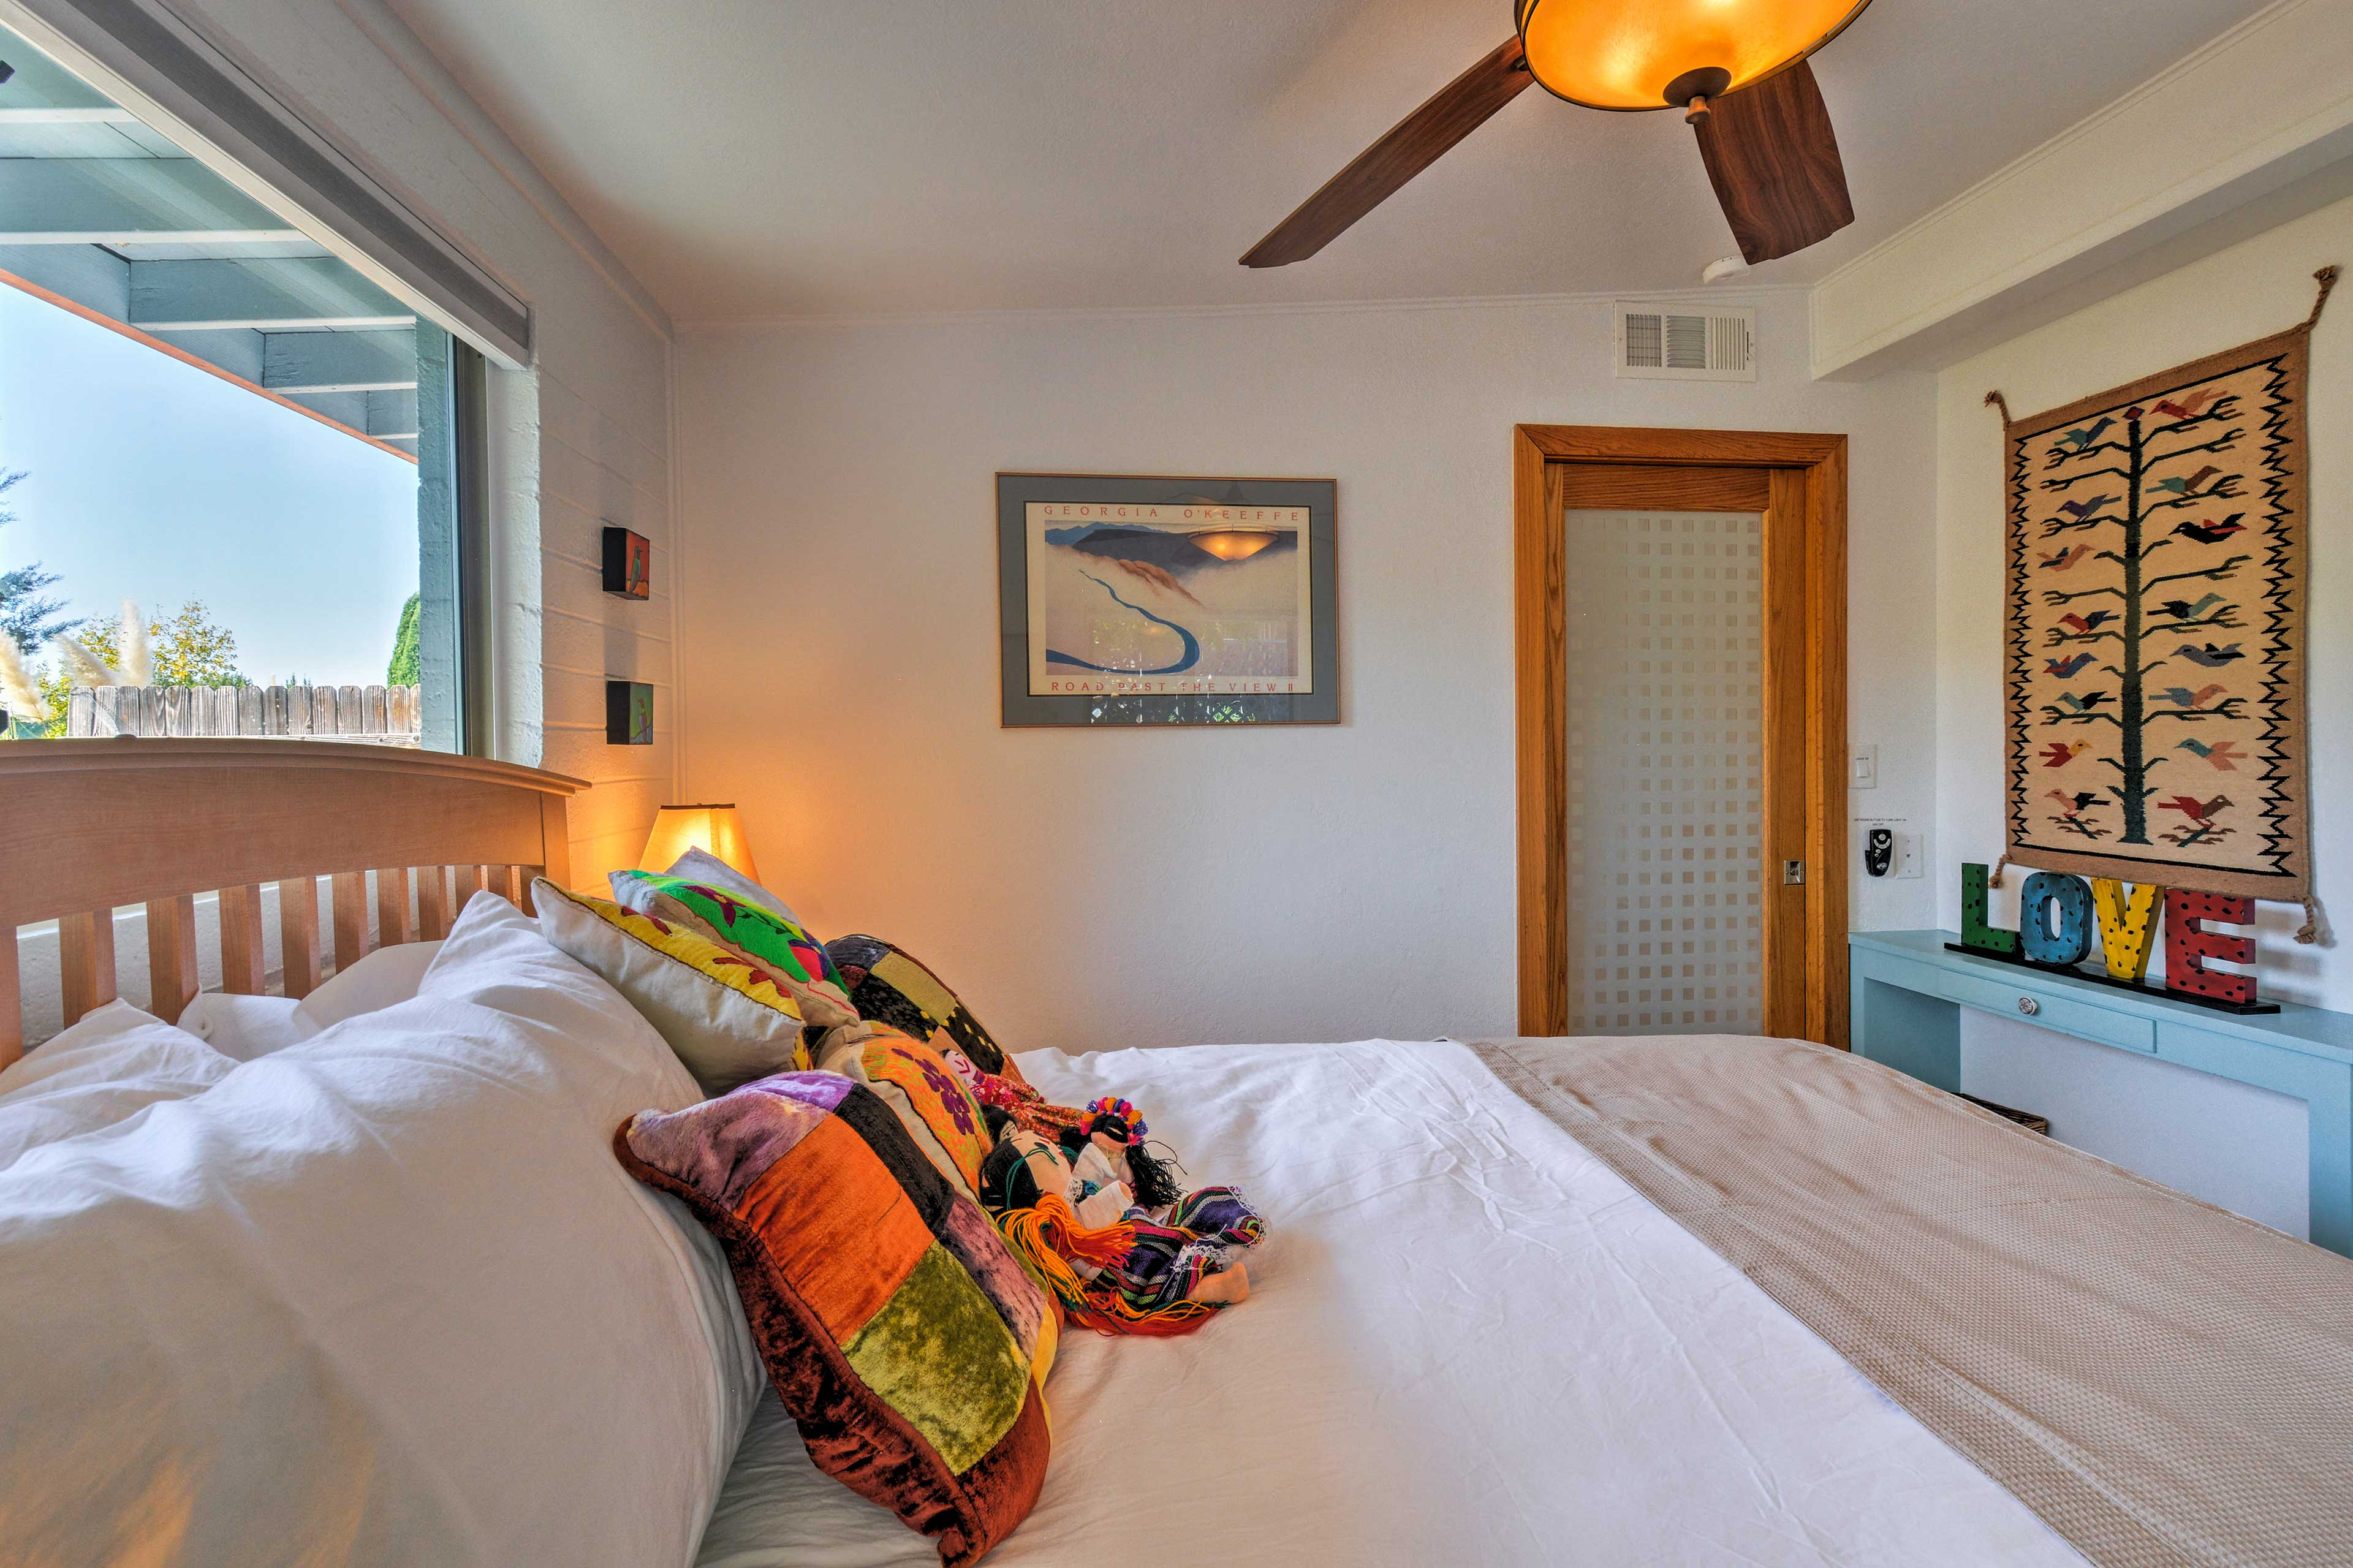 Bedroom 2 | Linens Provided